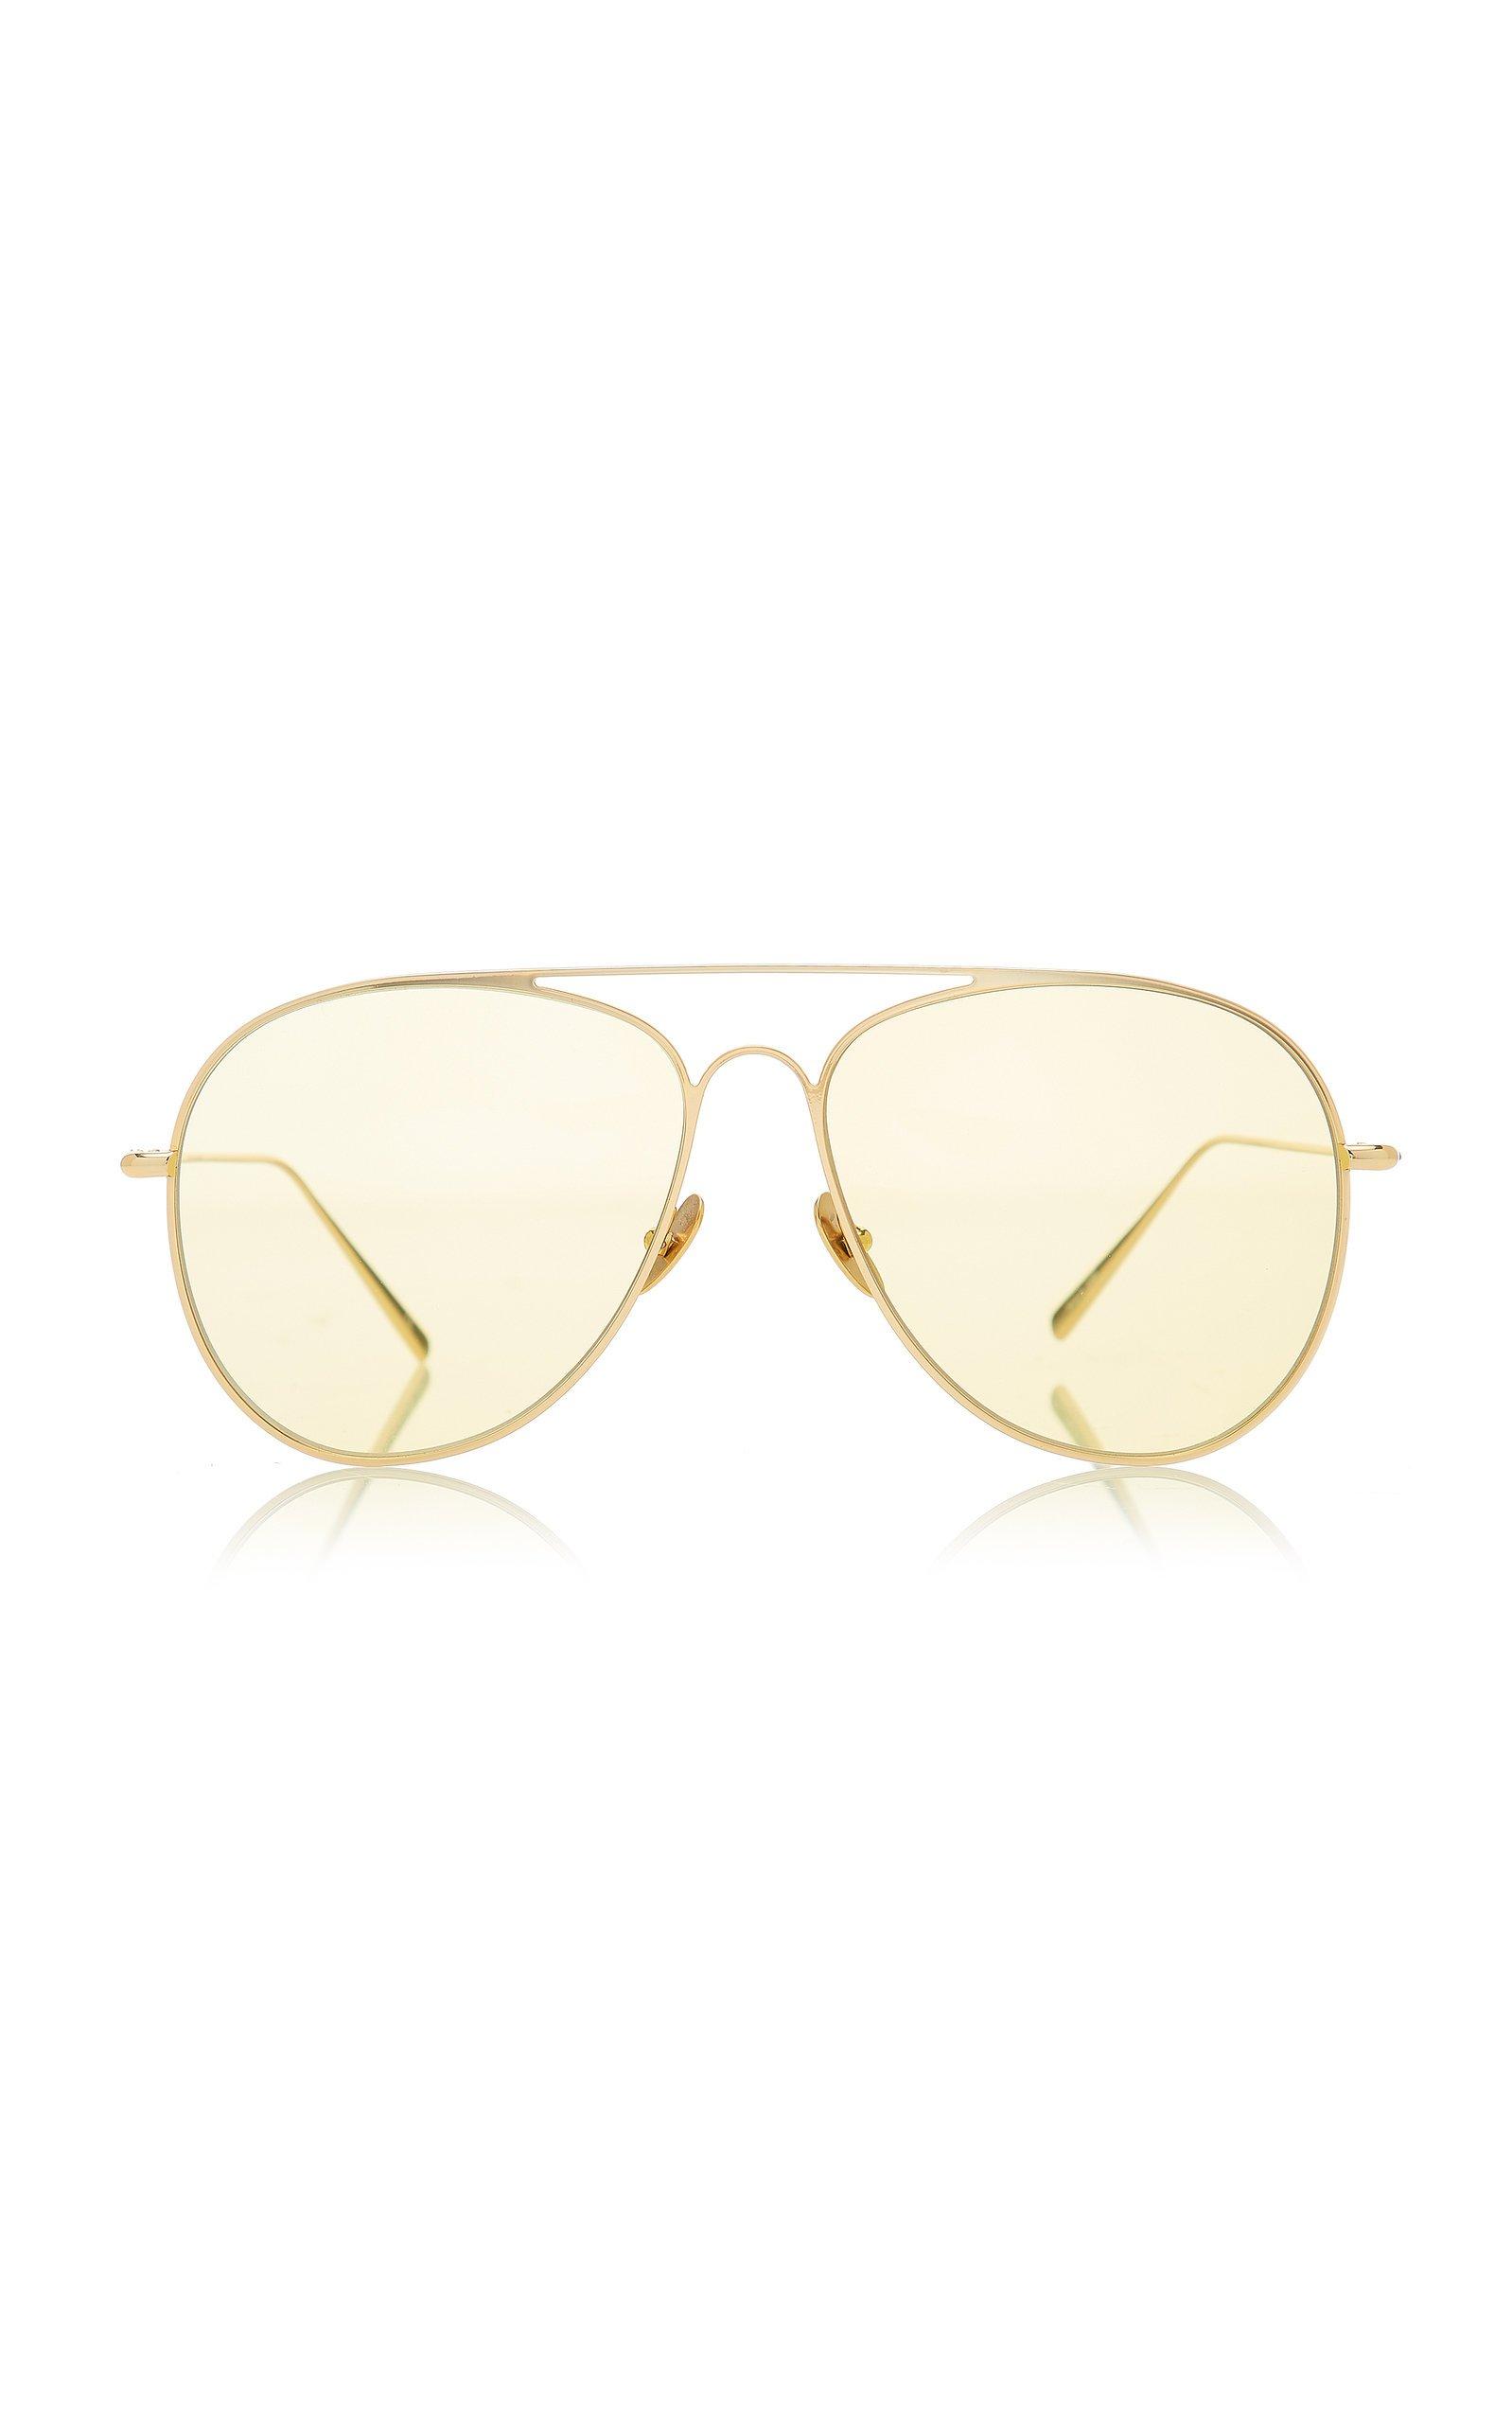 Kaleos Eyehunters Somerset Aviator Sunglasses